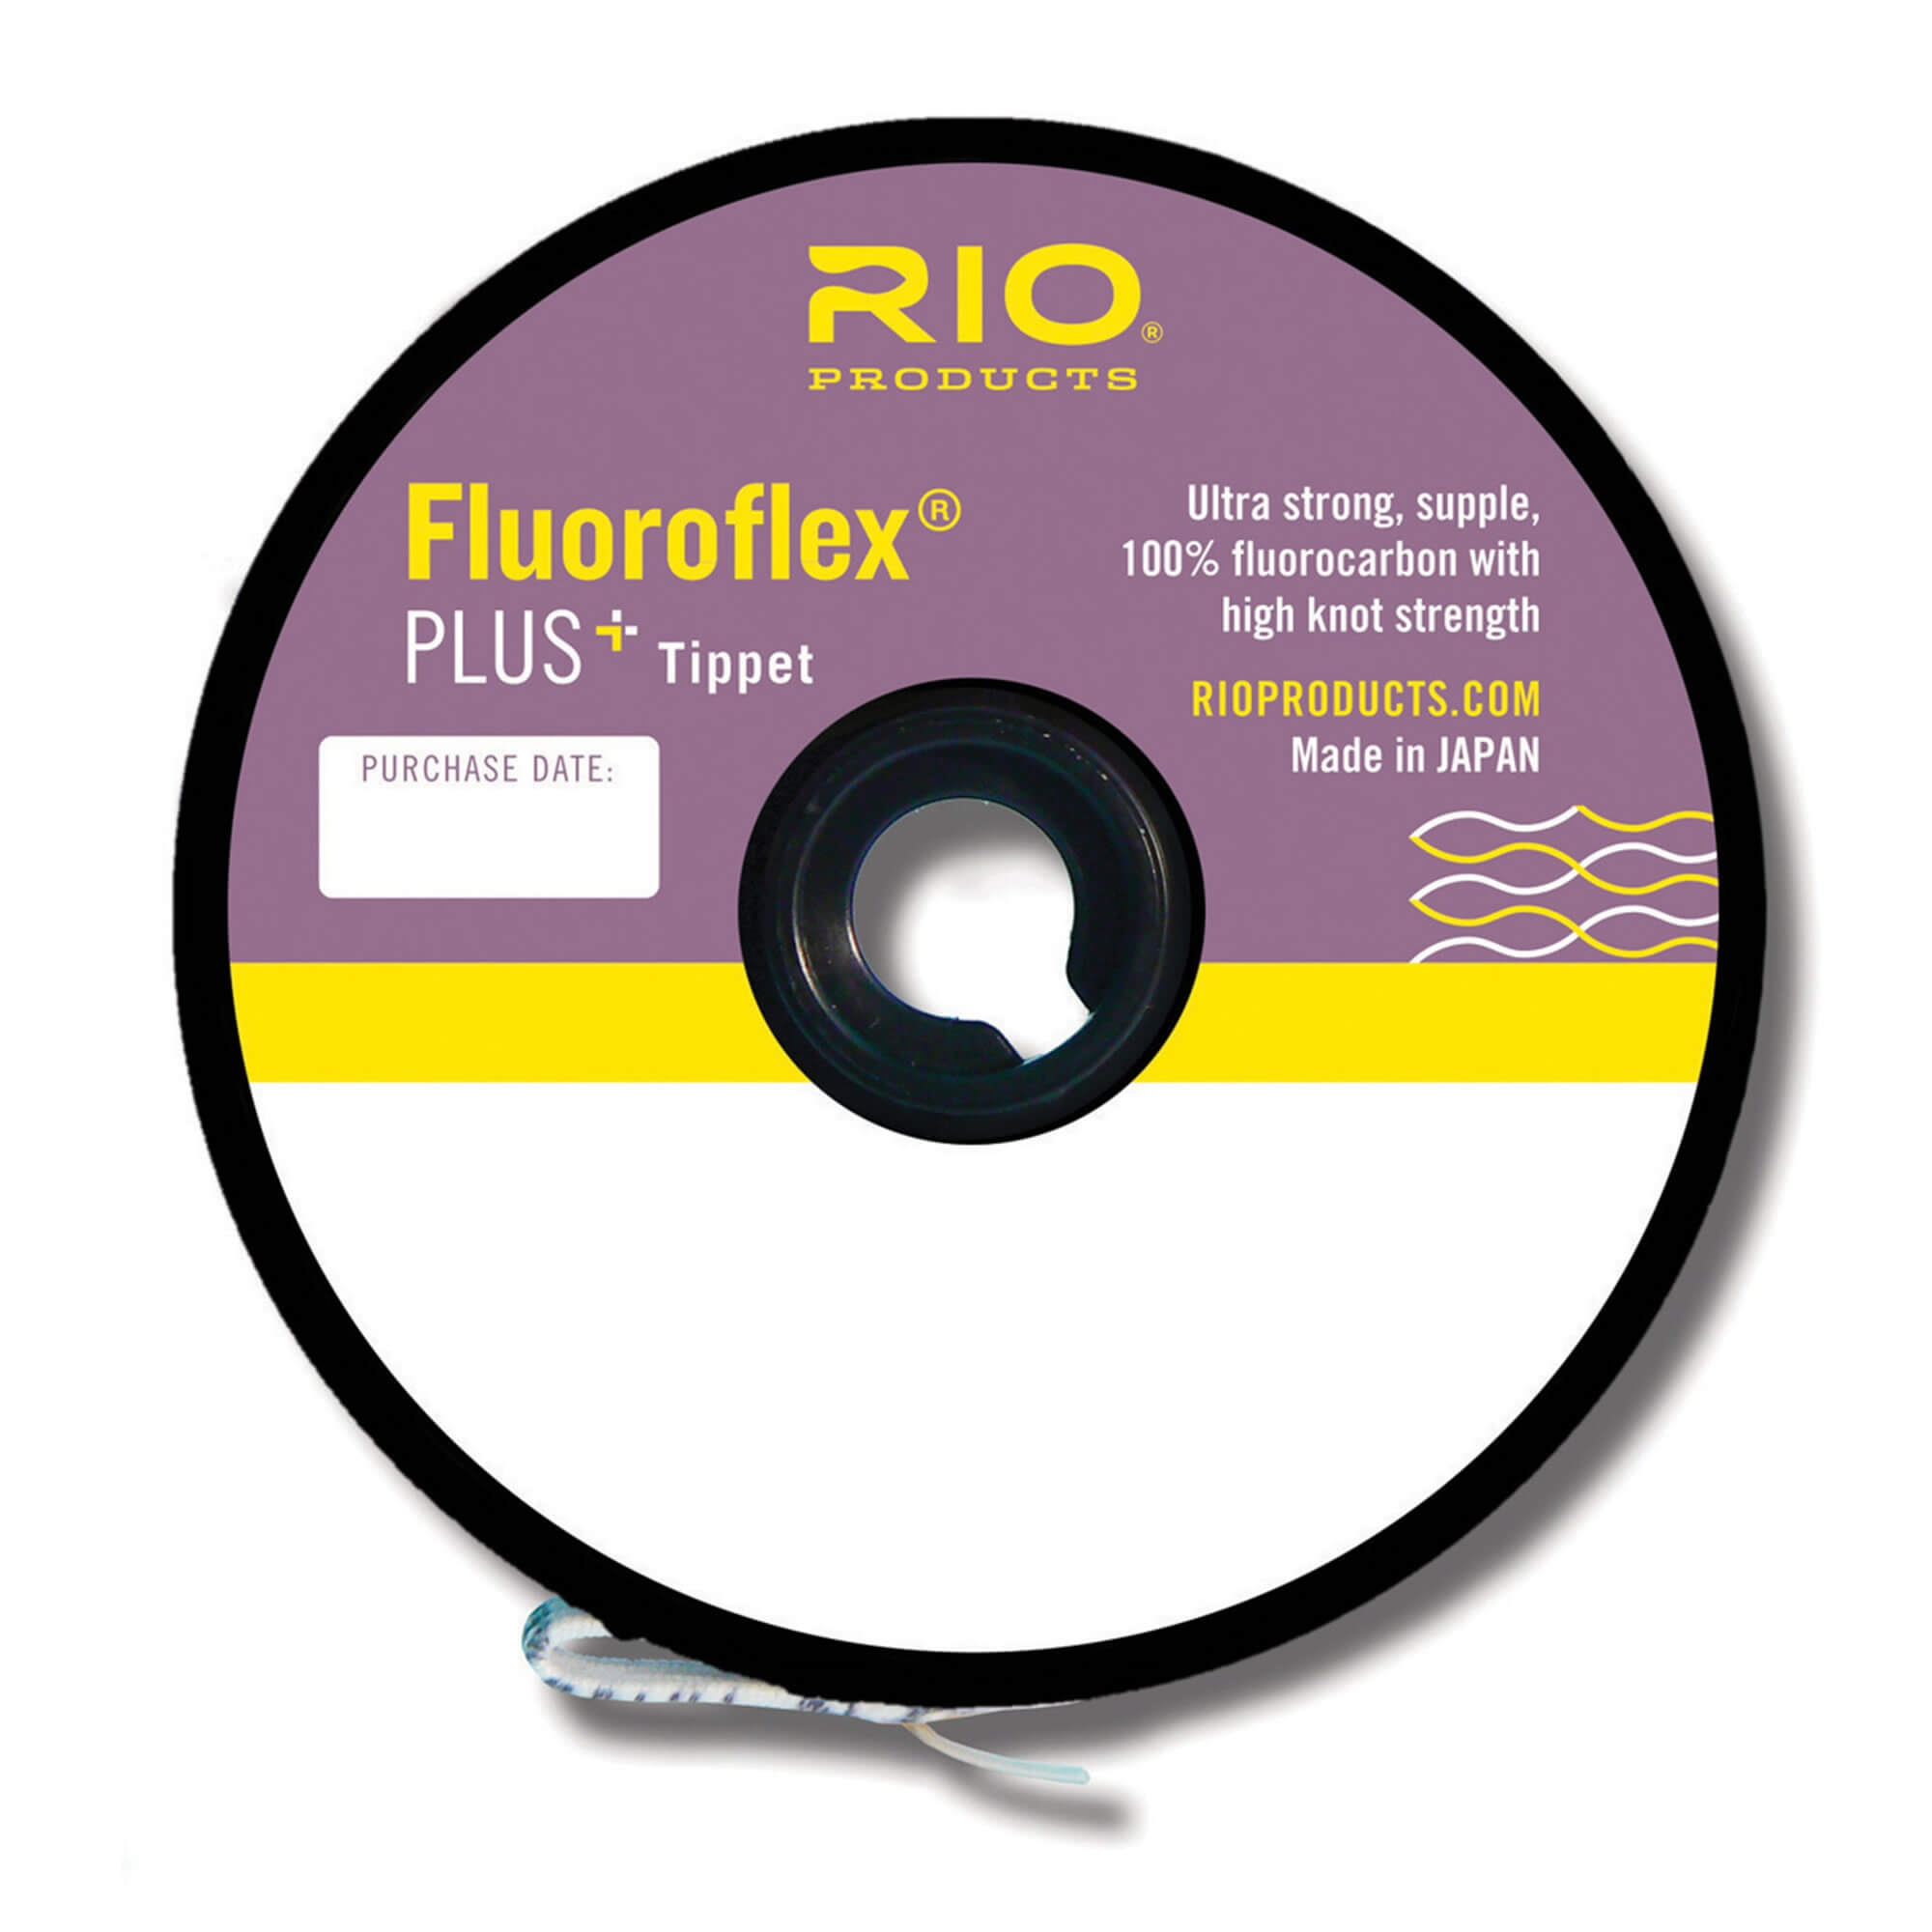 Freshwater Tippet Fluoroflex Plus